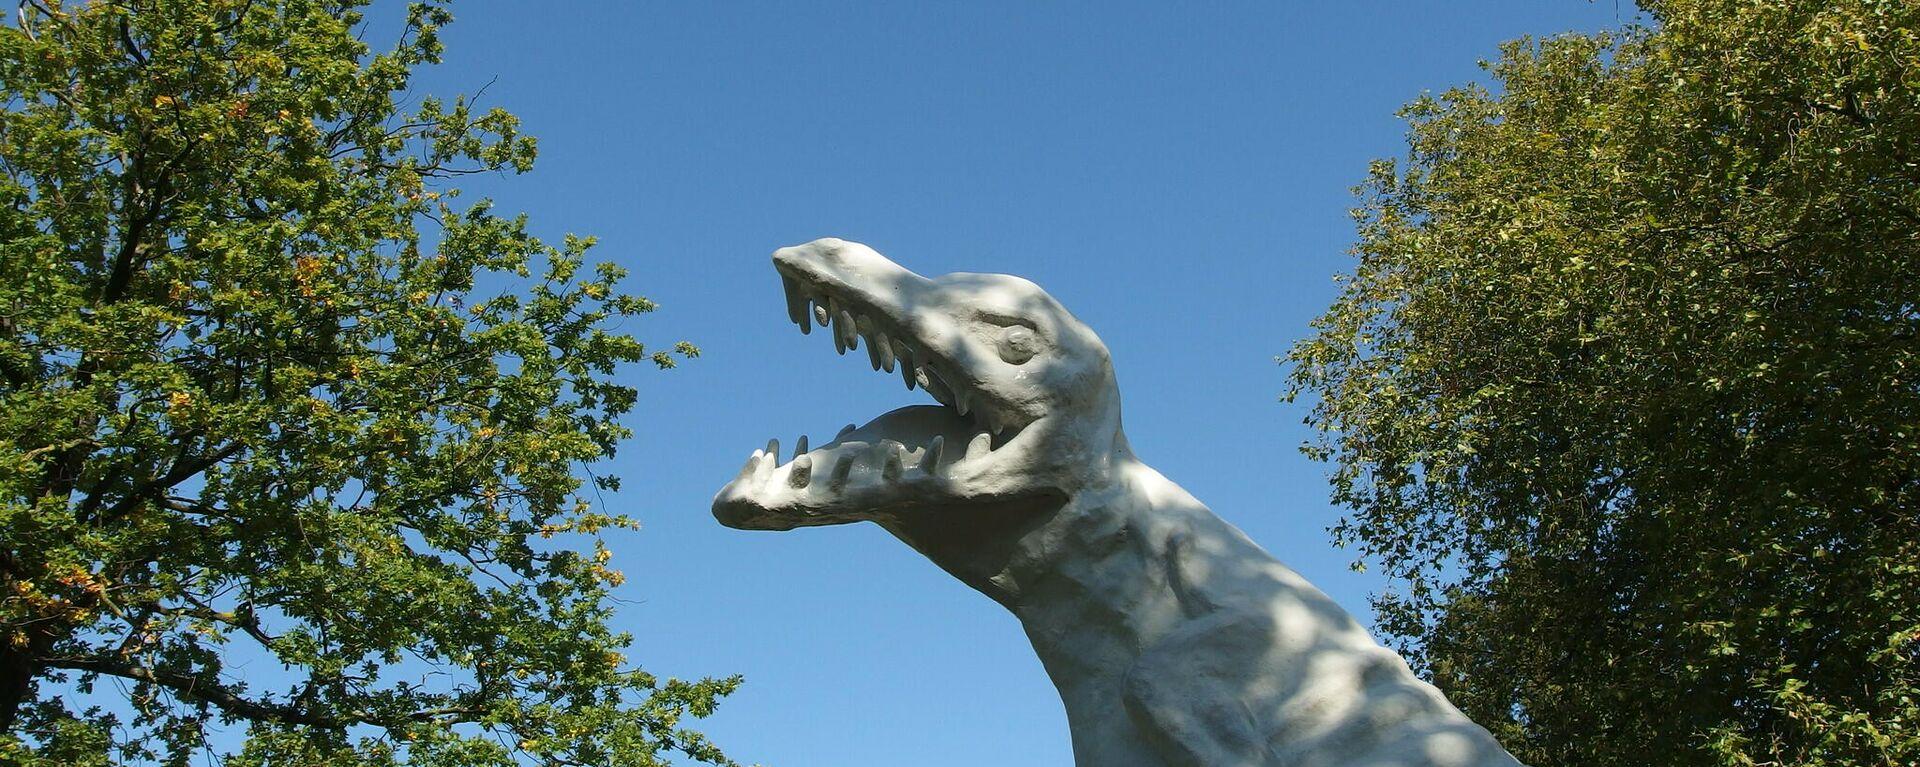 Dino-Statue (Symbolbild) - SNA, 1920, 25.05.2021